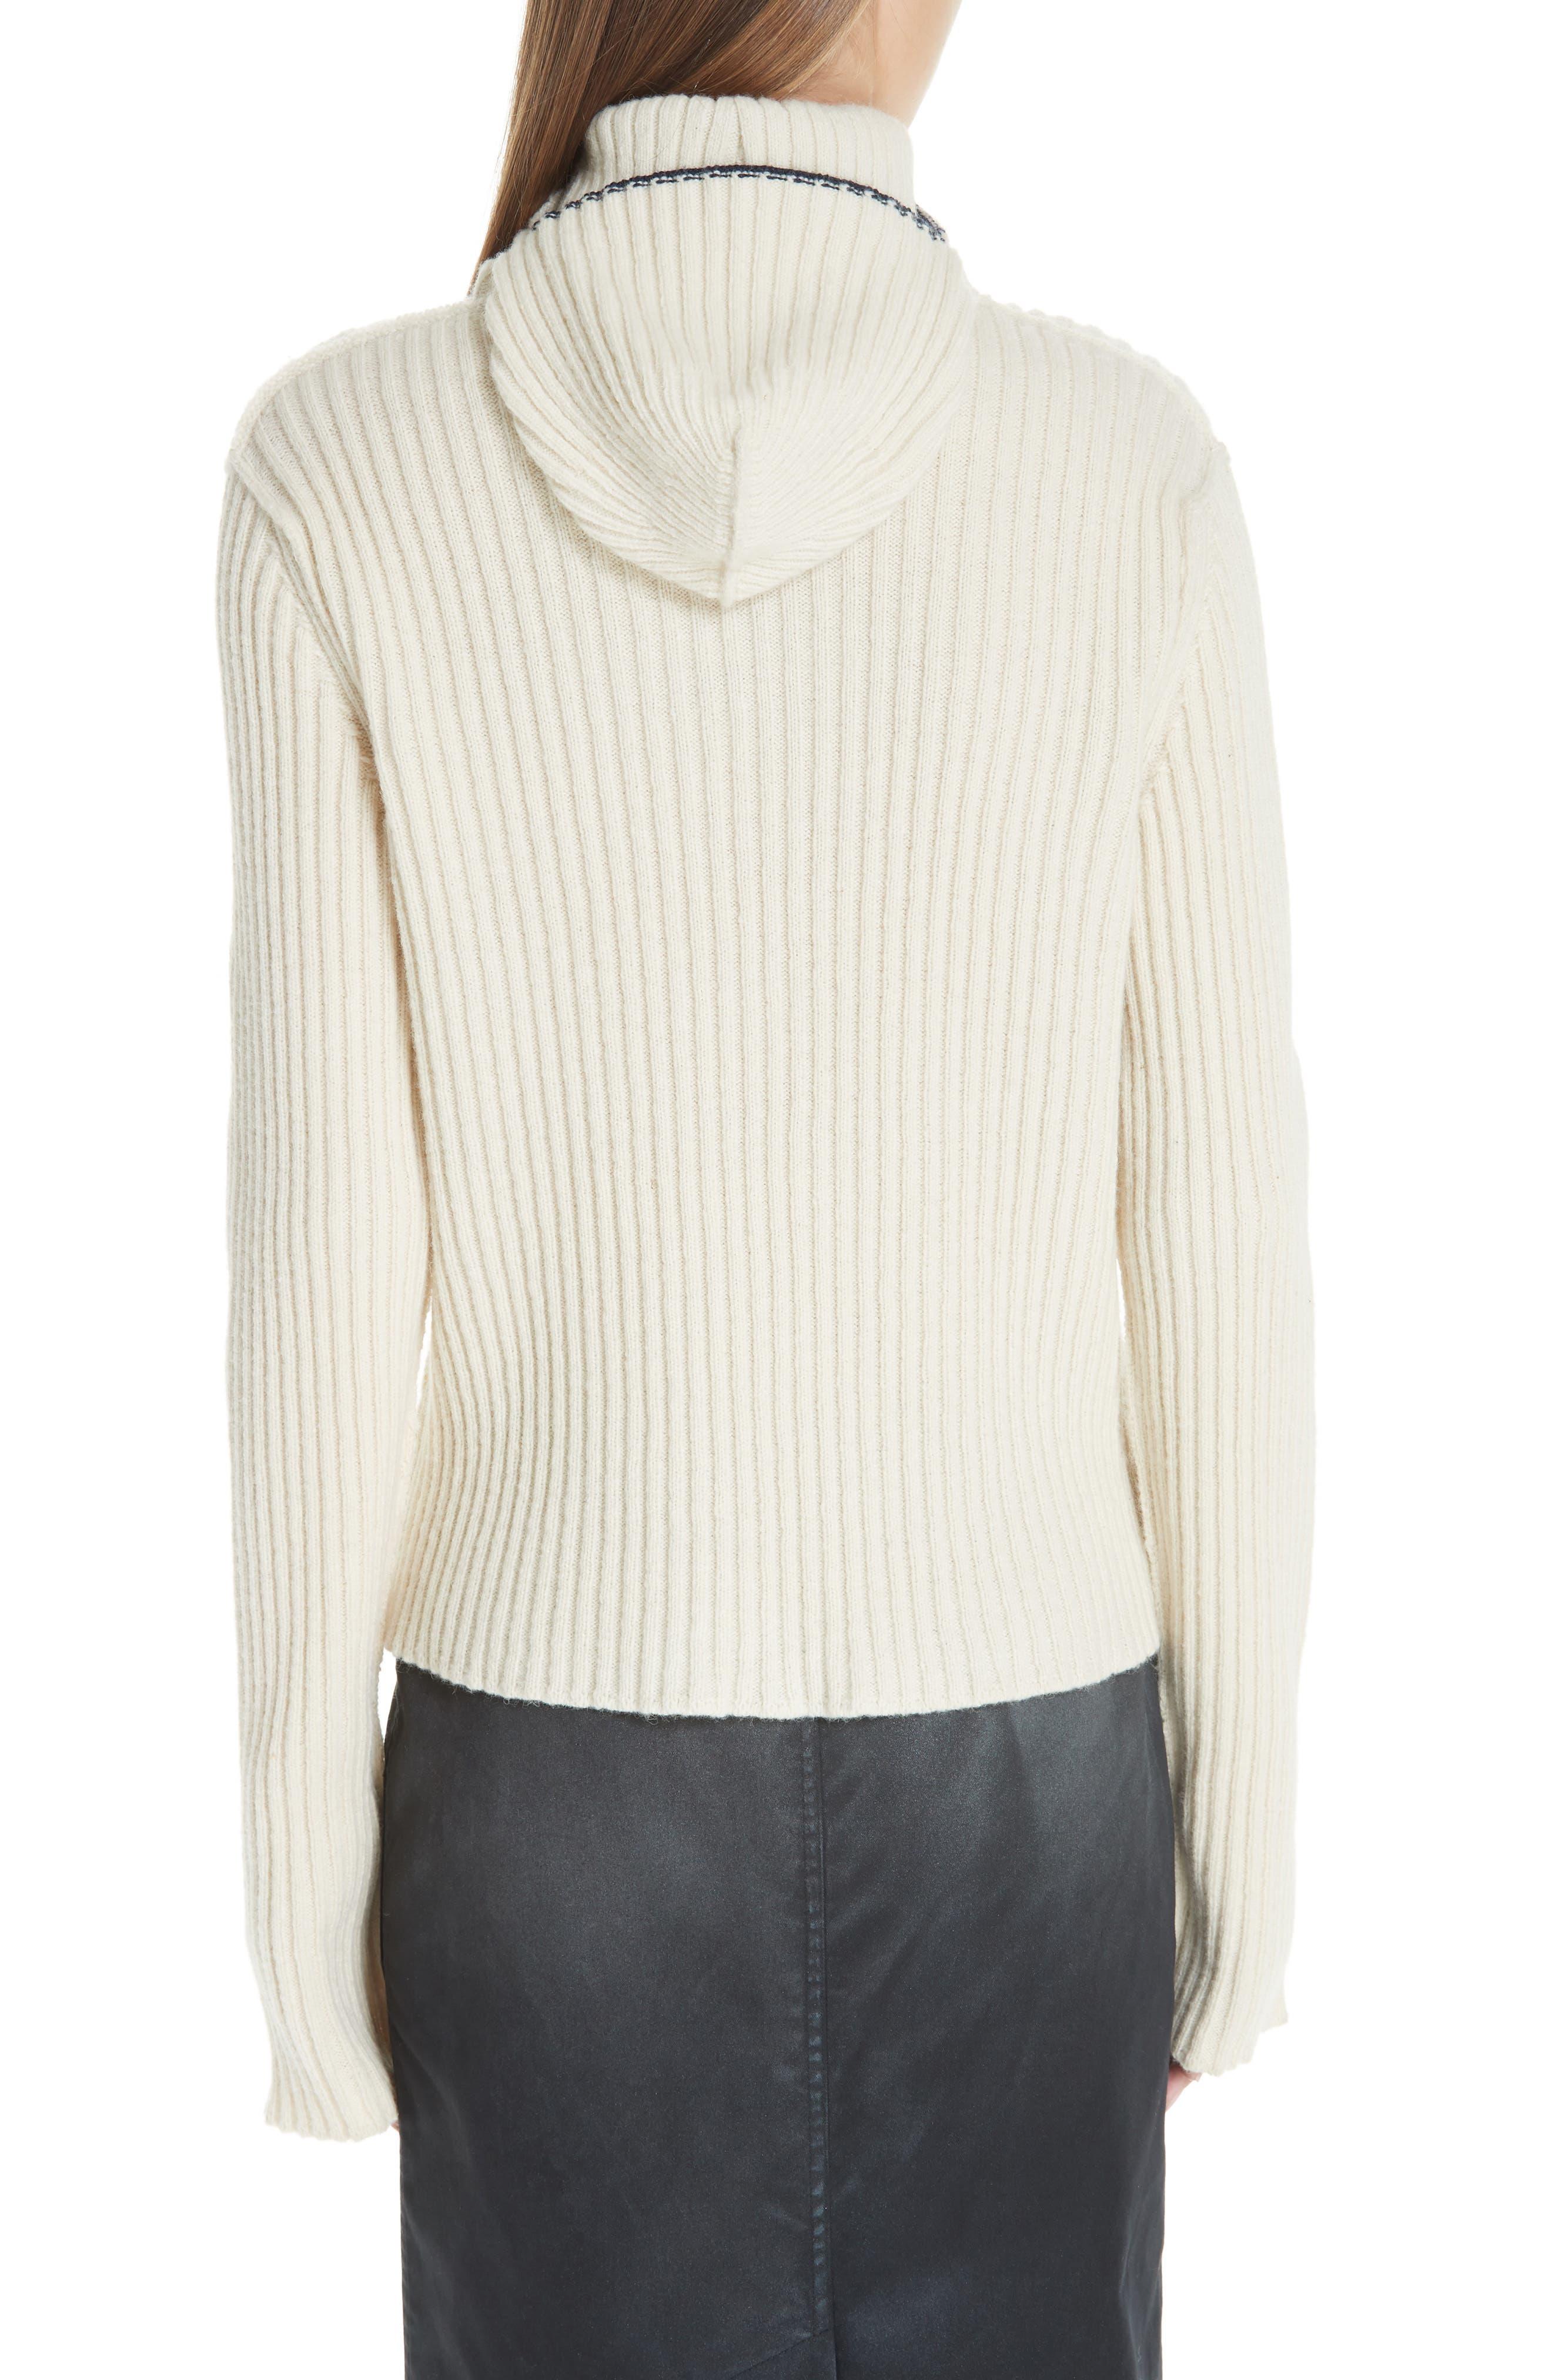 Quilt Jacquard Stripe Sweater,                             Alternate thumbnail 2, color,                             ECRU HAY NAVY